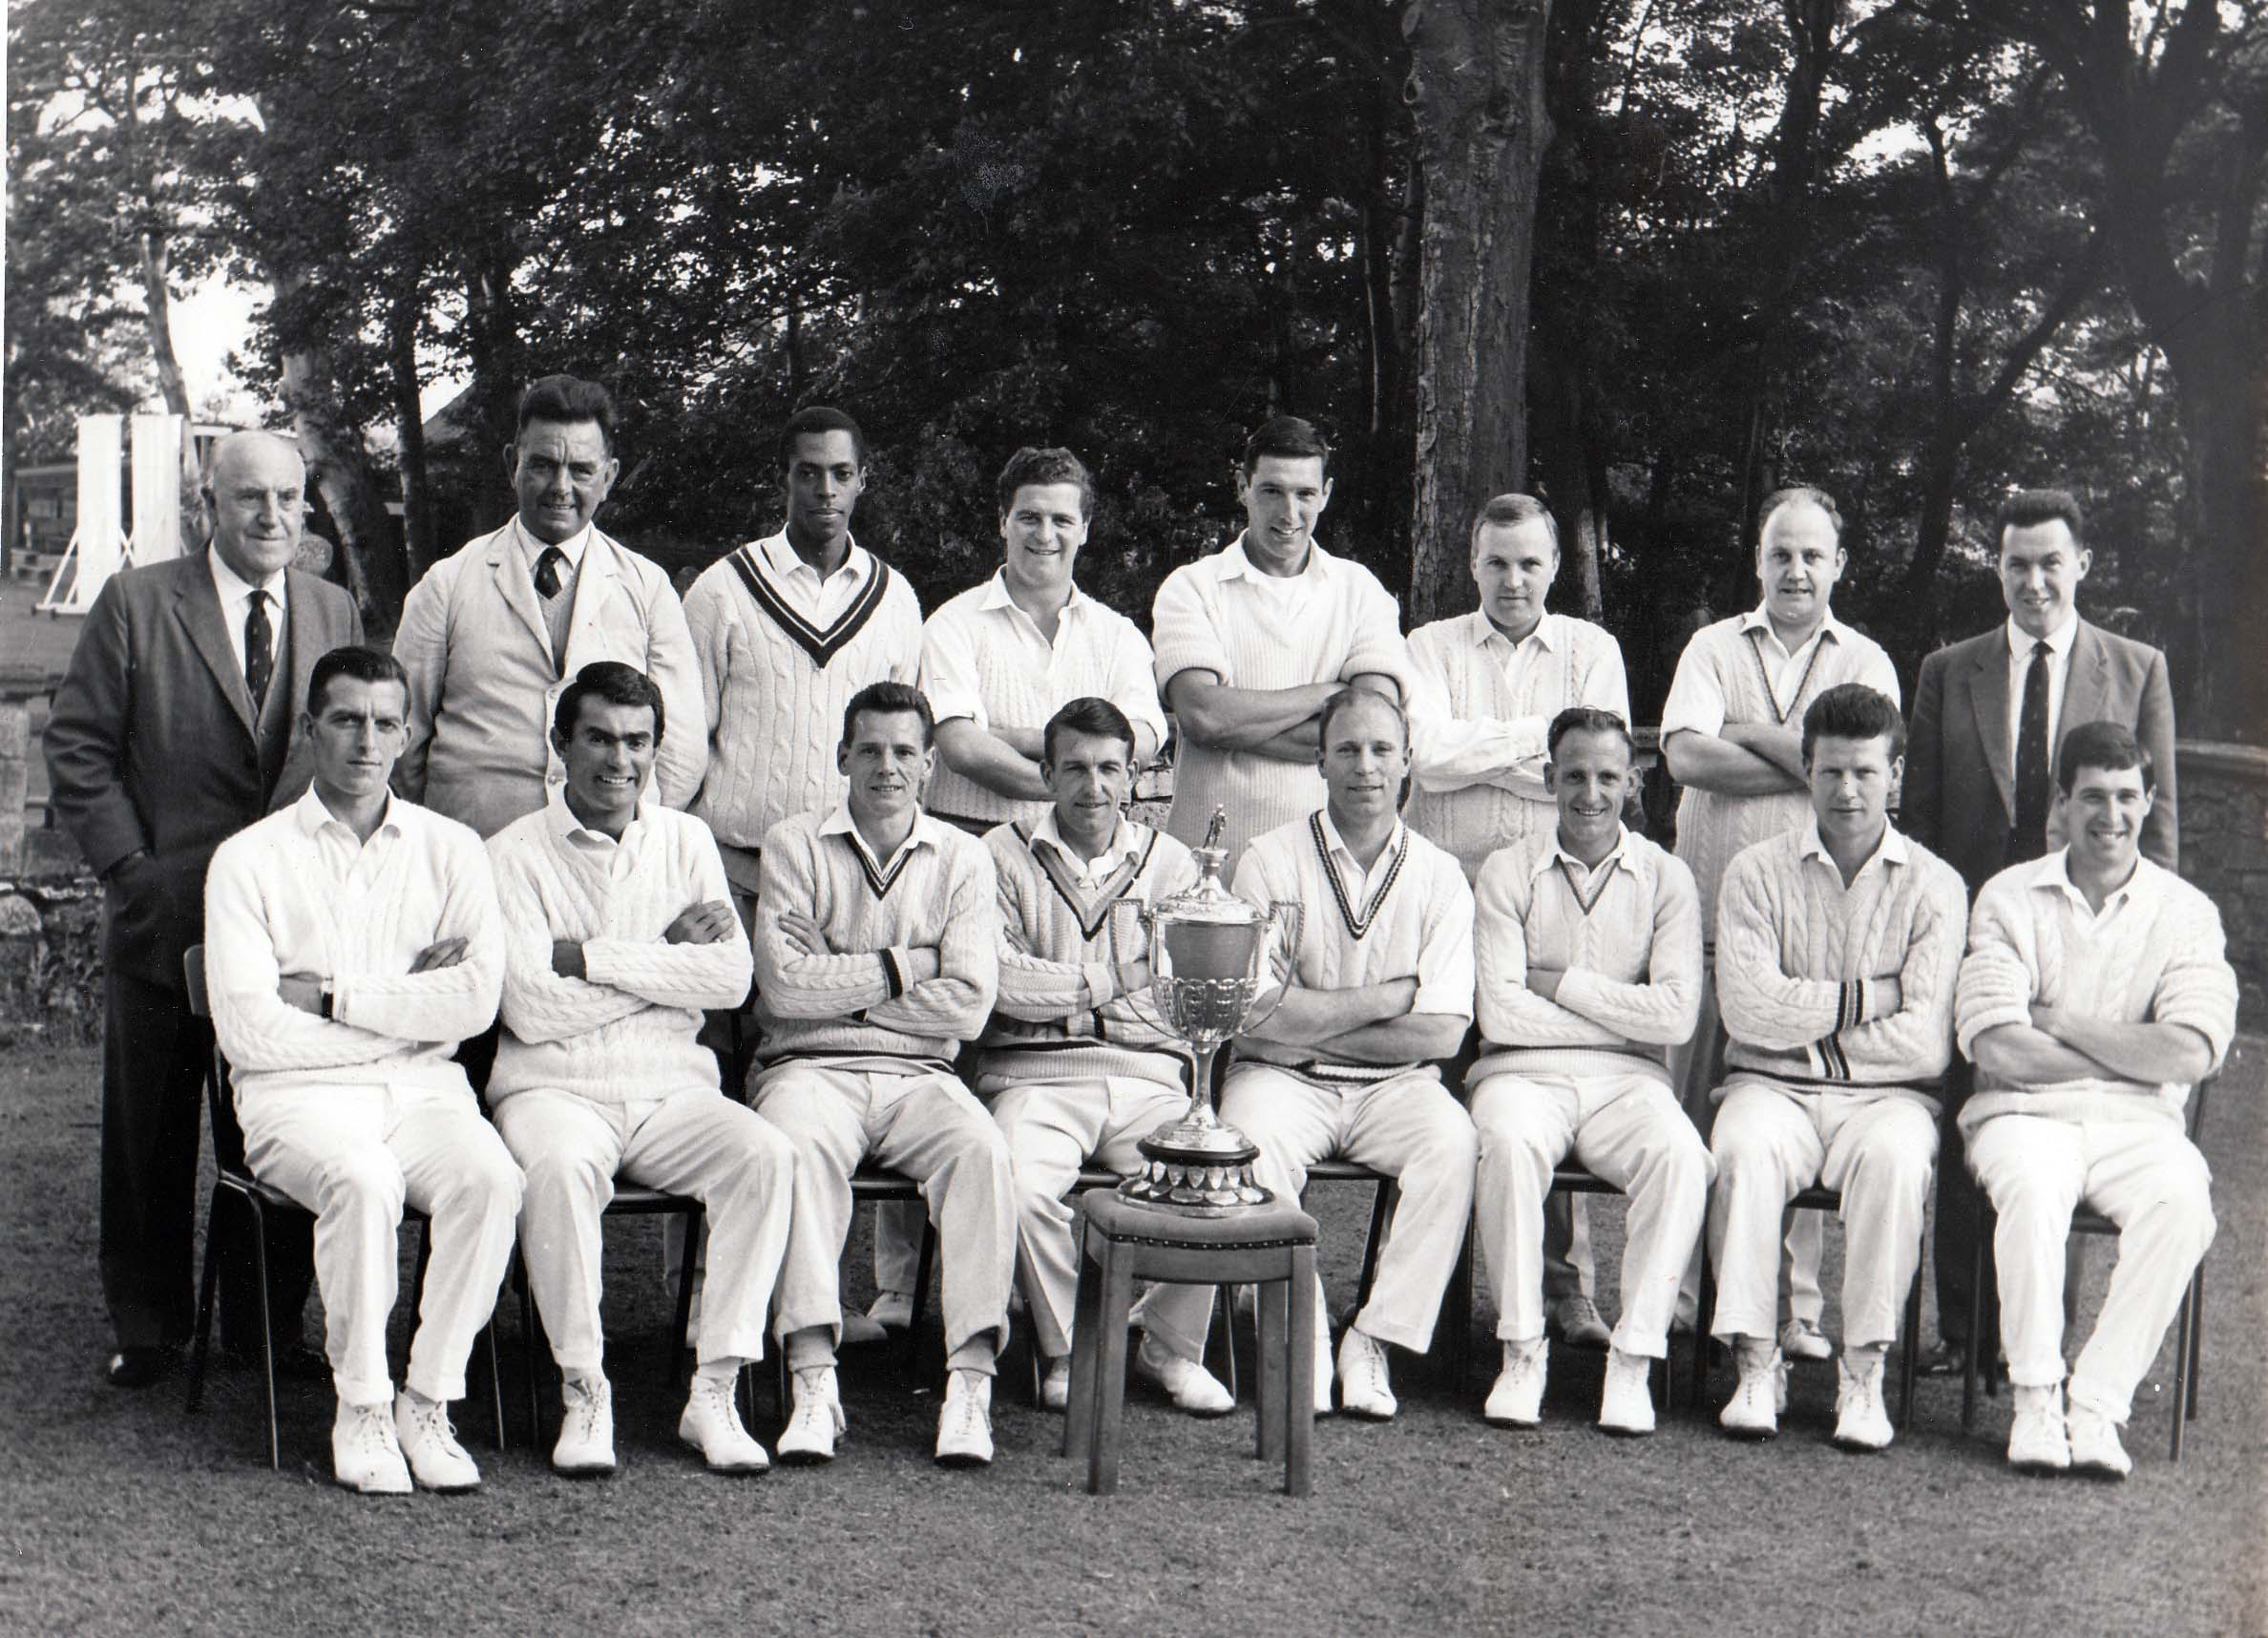 Champions 1964 page 21